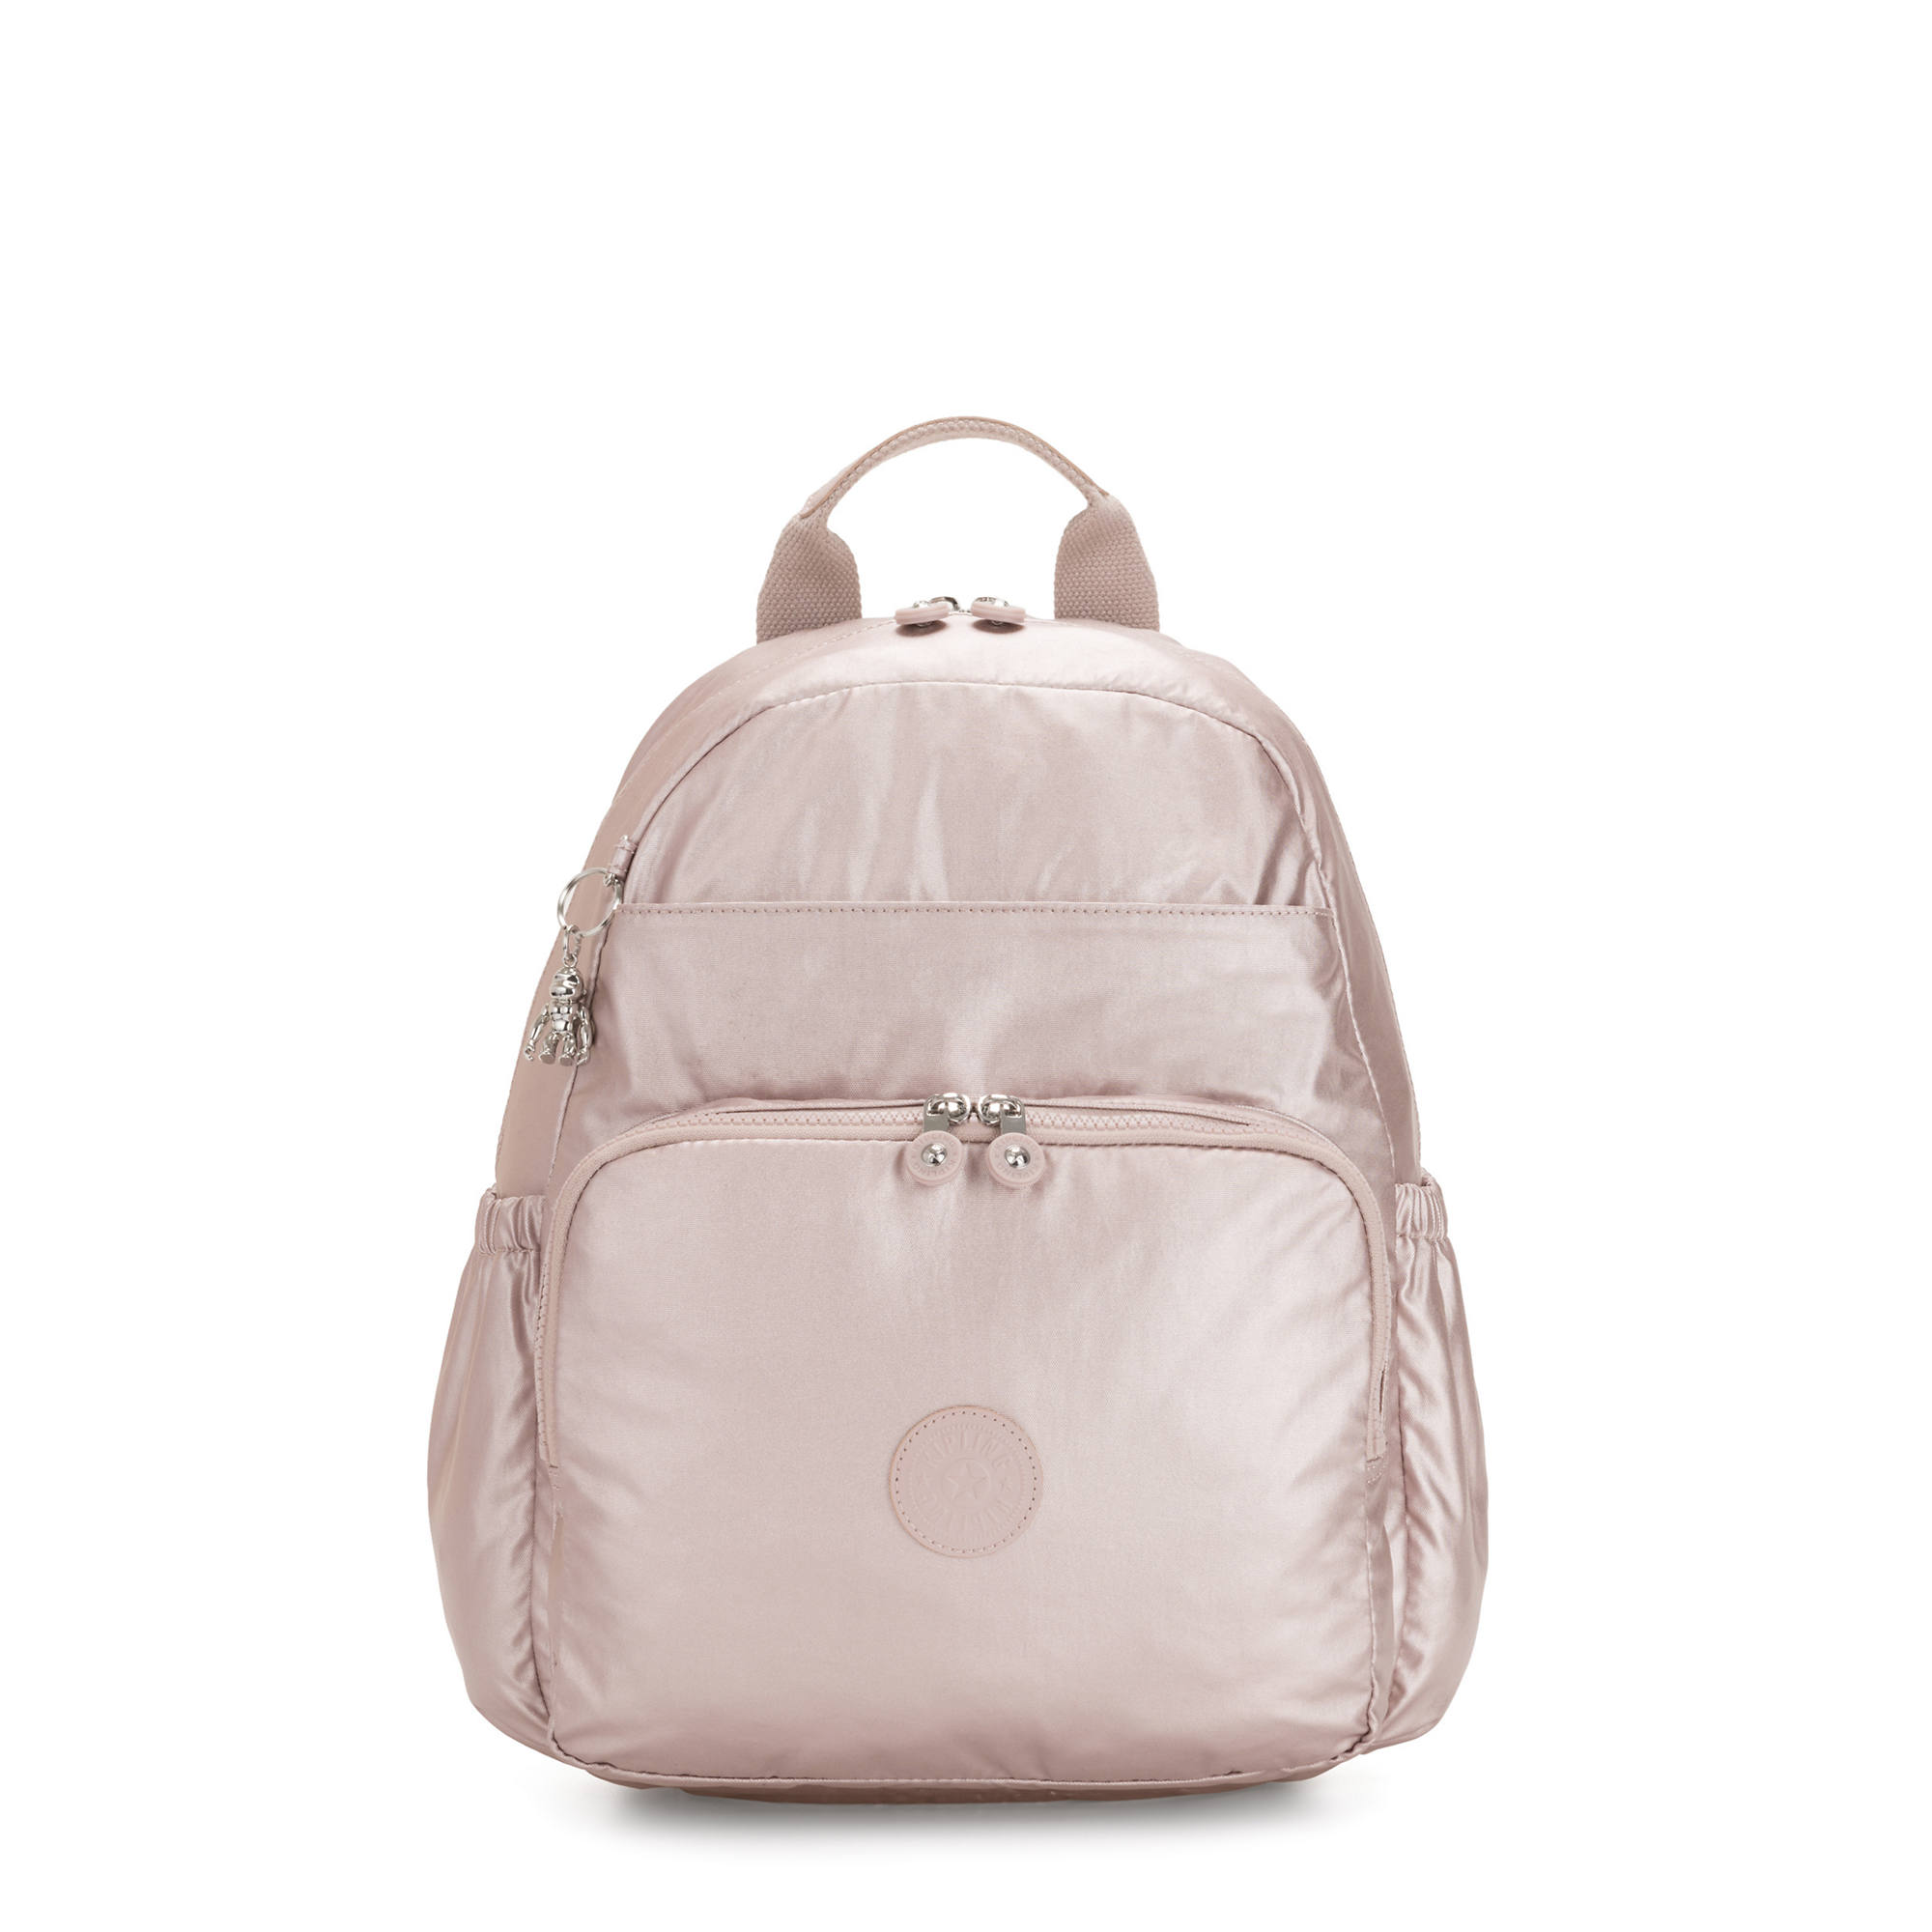 Maisie Metallic Diaper Bag Backpack